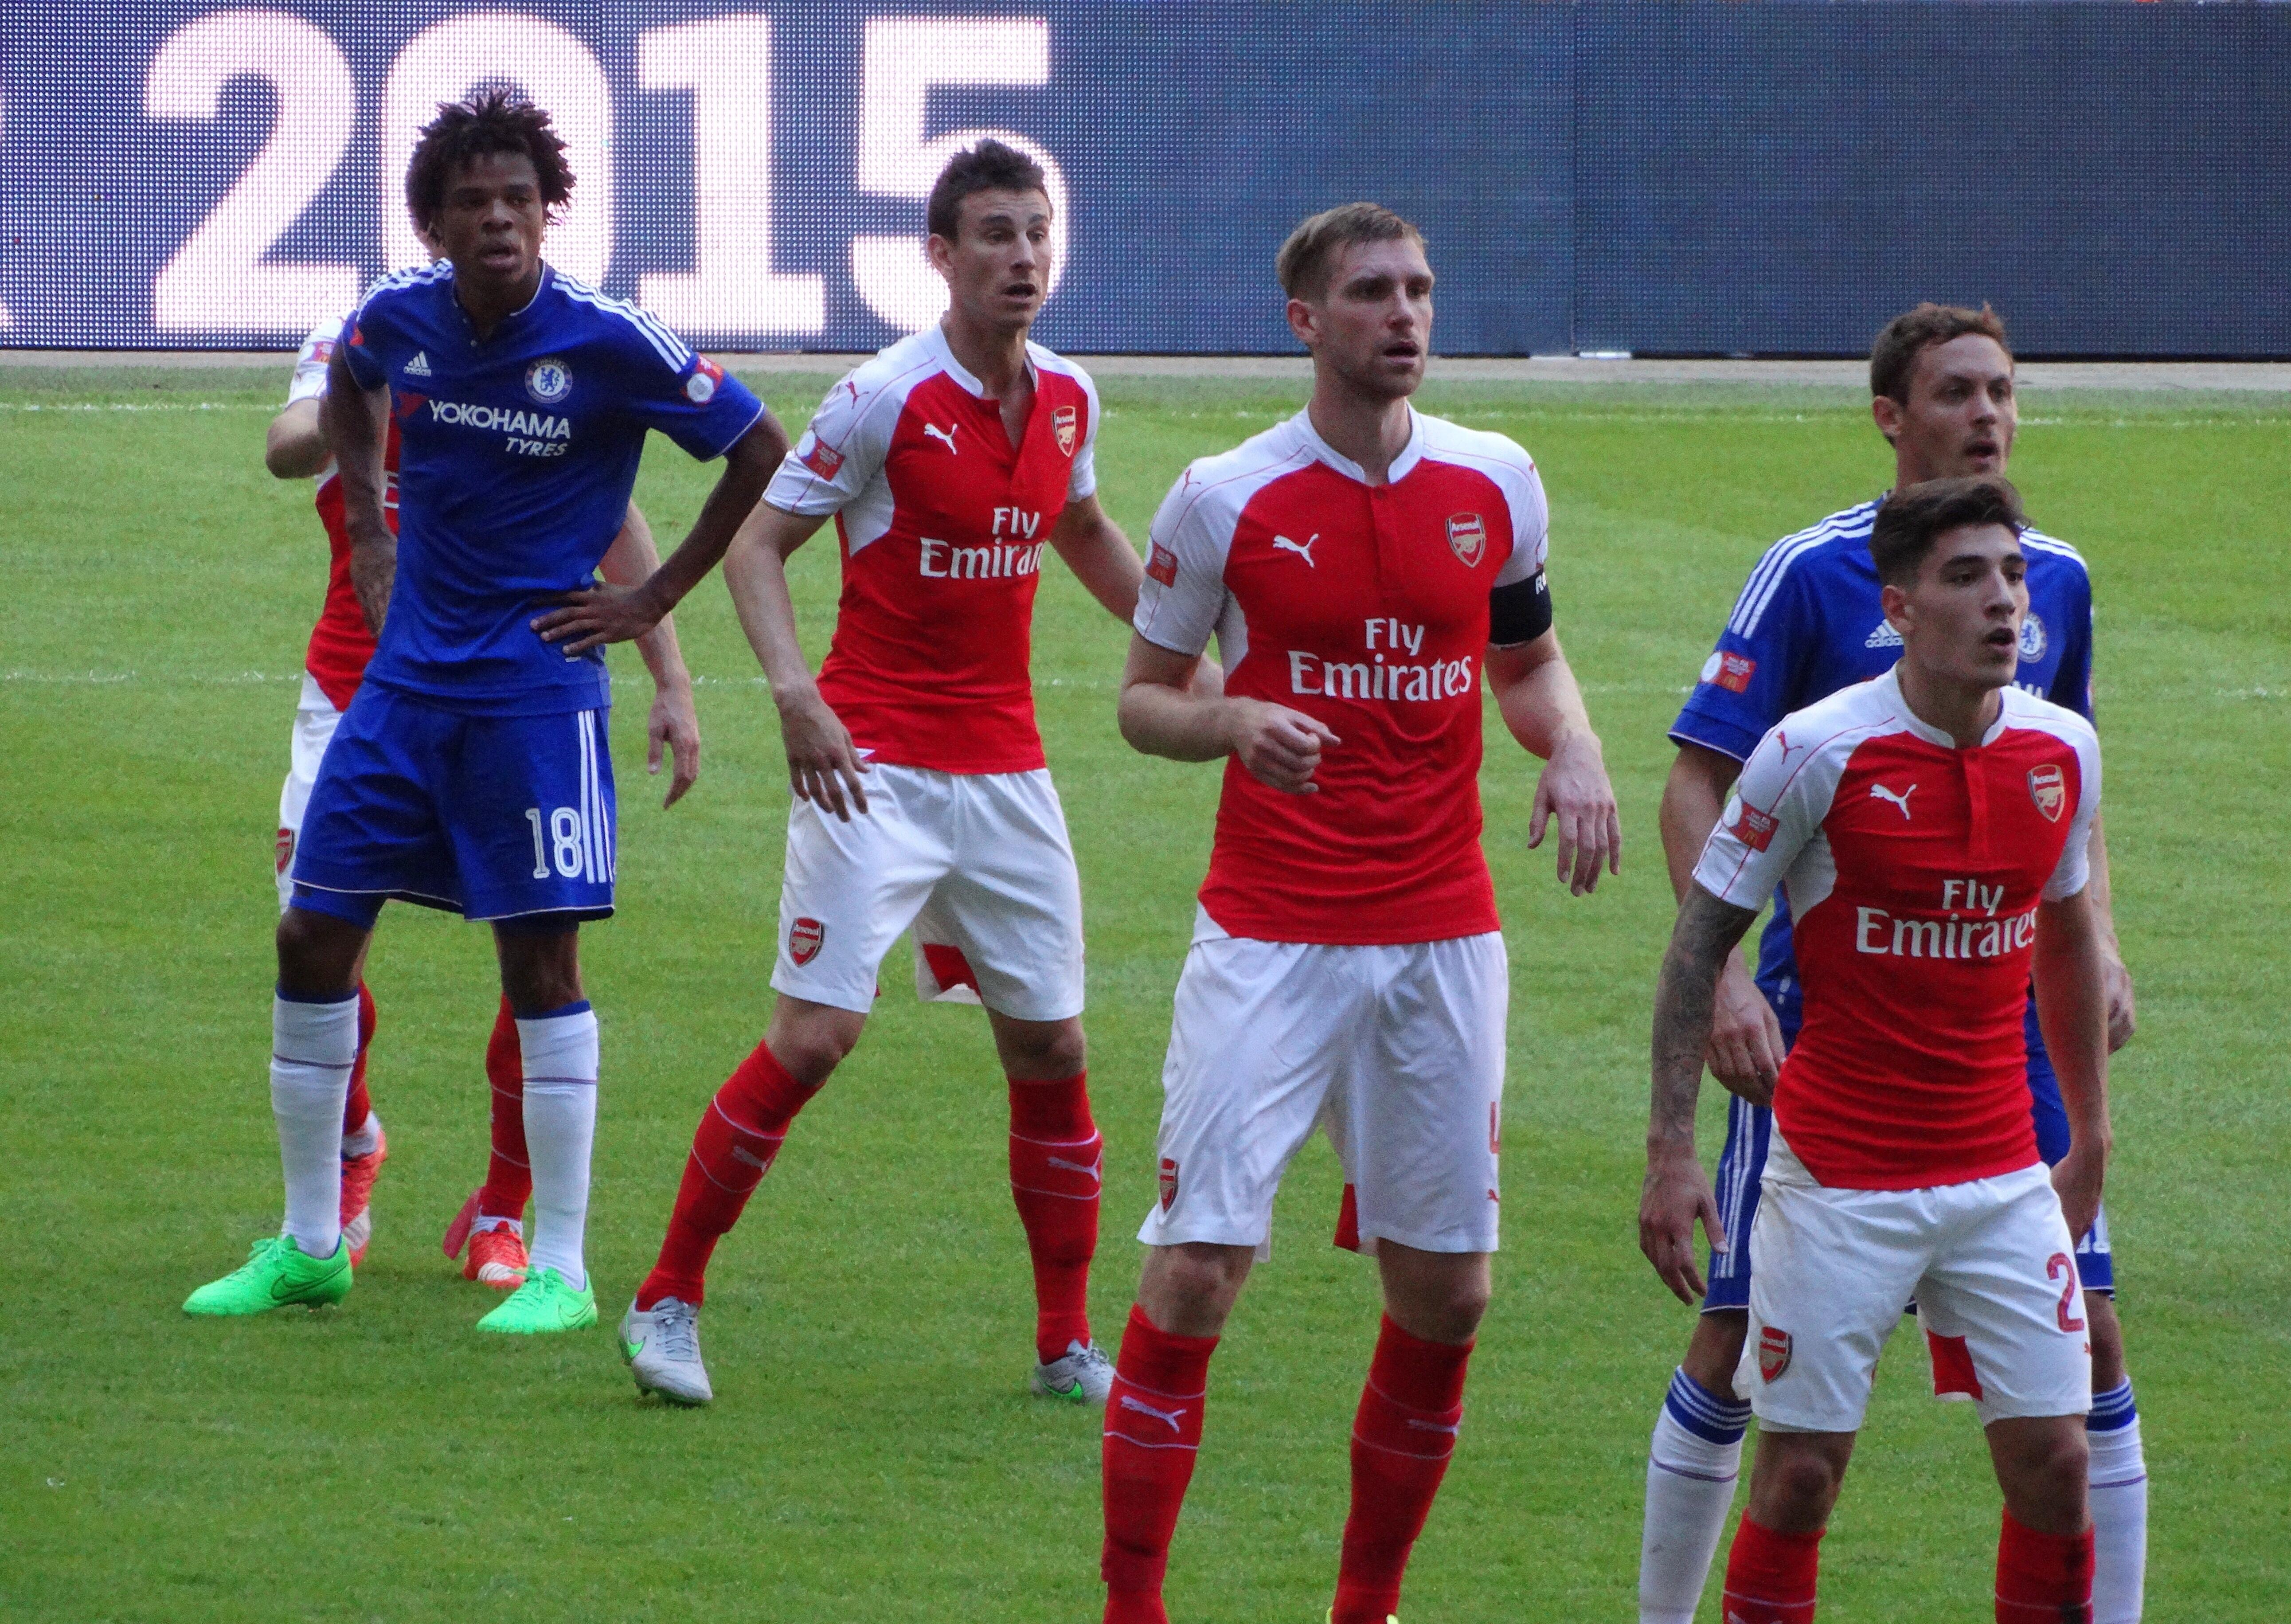 Arsenal Wikipedia: File:Arsenal 1 Chelsea 0 (20071401648).jpg